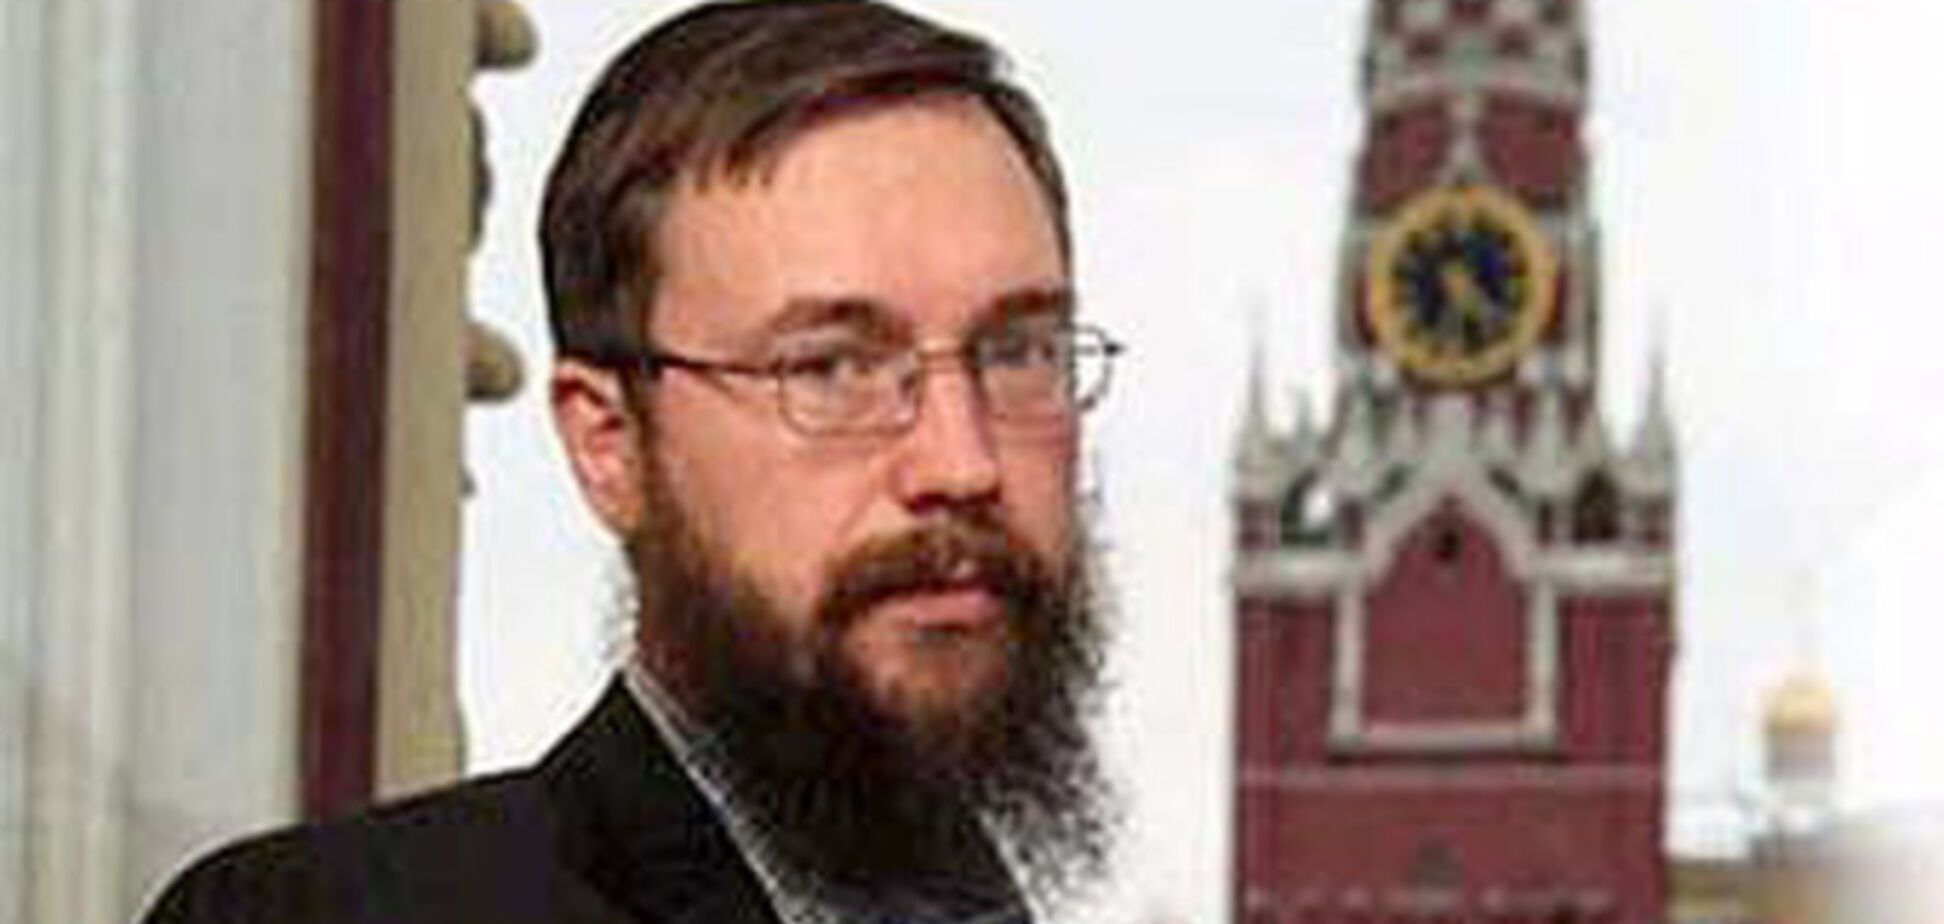 Российский бизнесмен предложил 'ЛНР' отказаться от электричества и газа